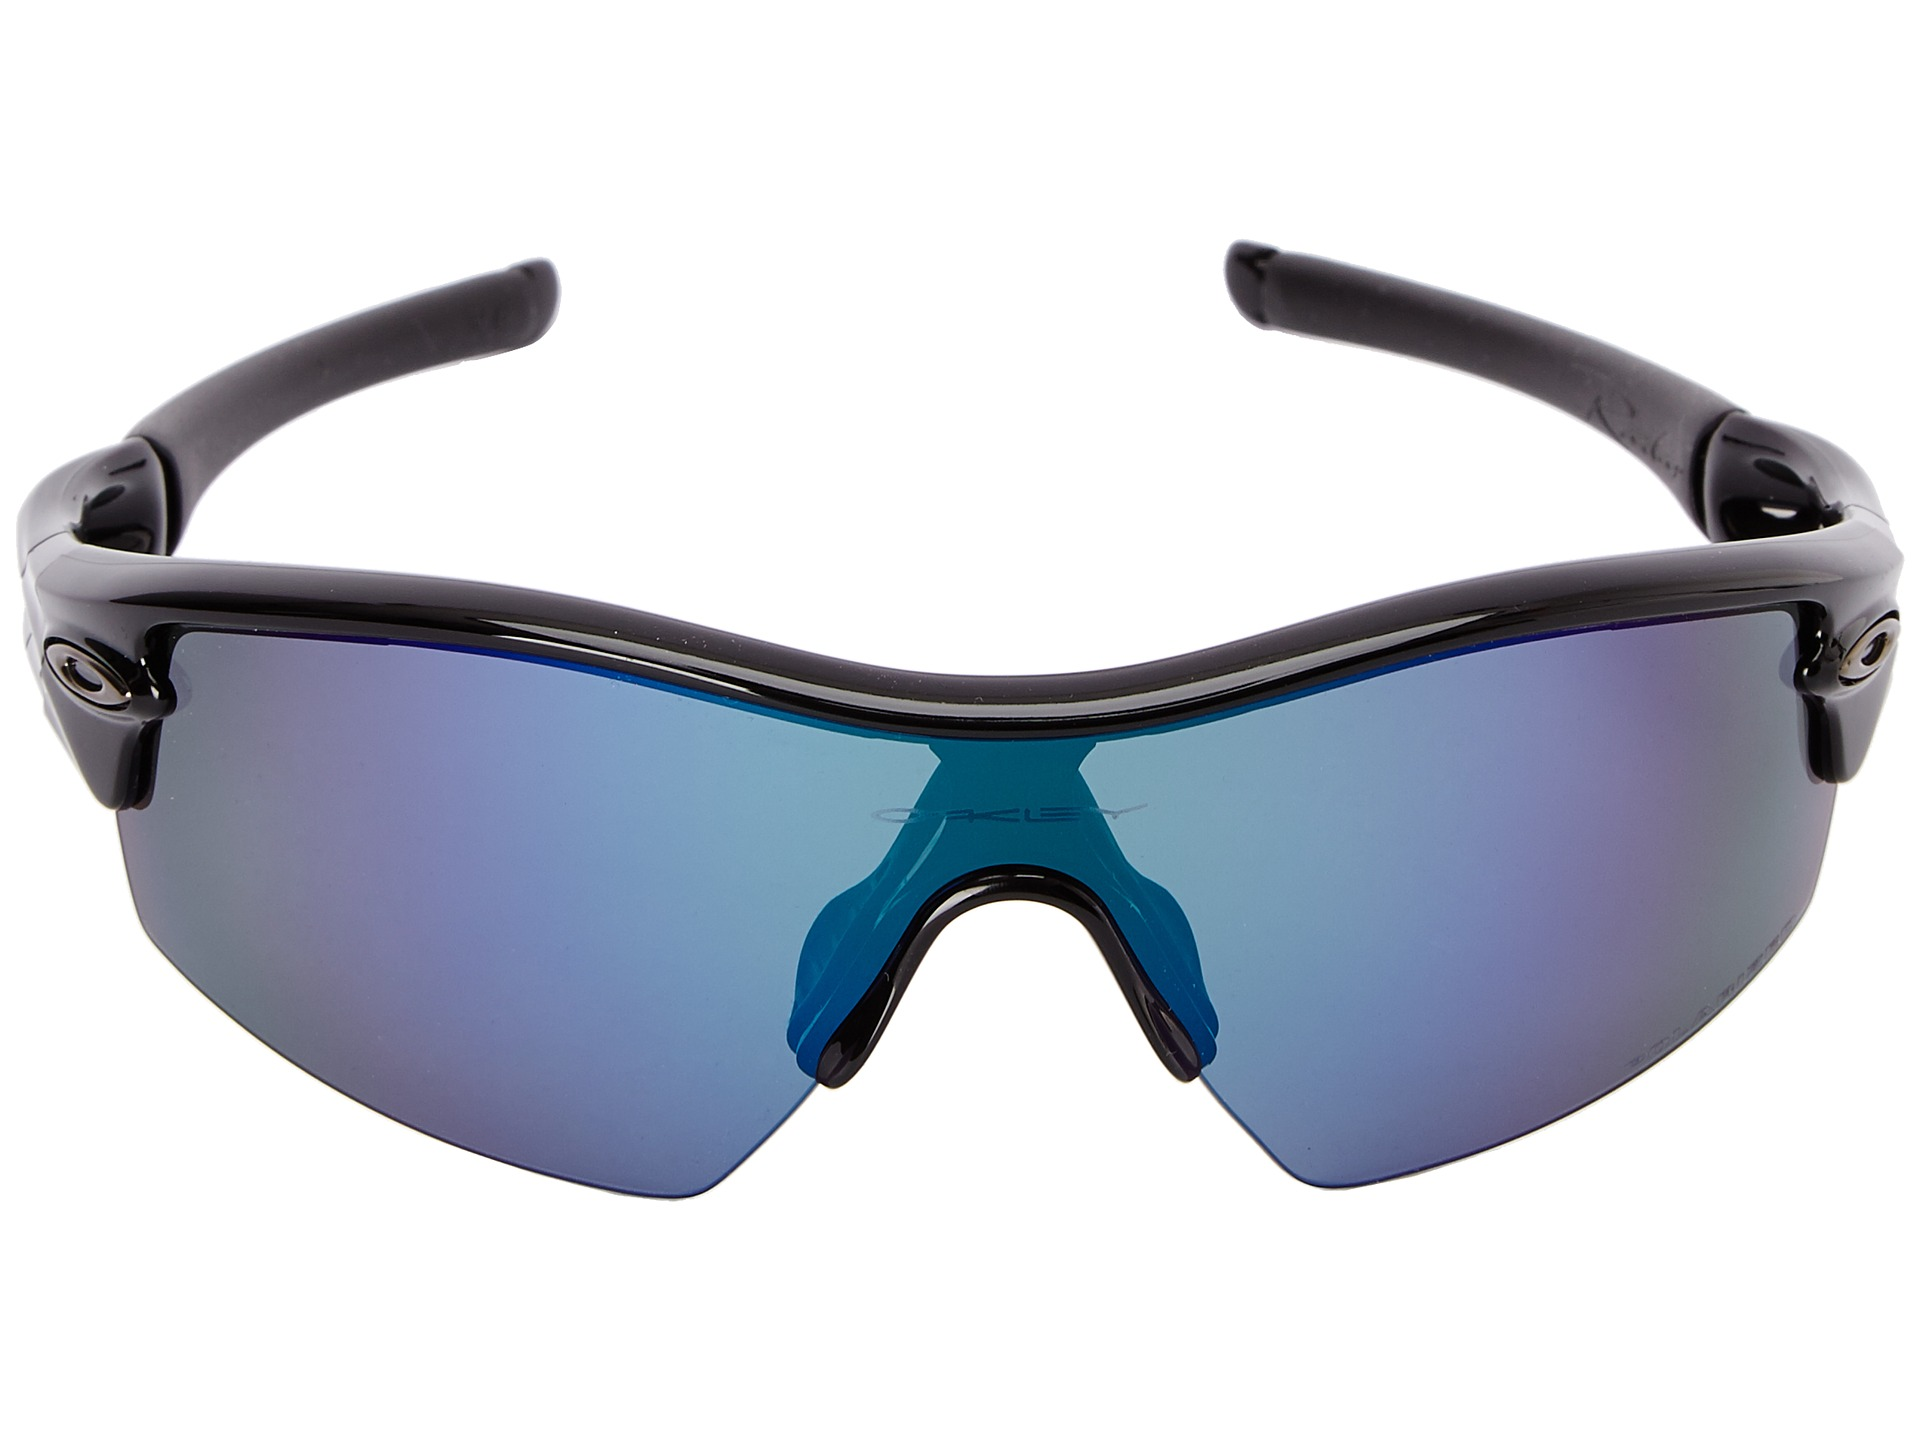 48820f60601 Oakley Deep Blue Iridium Polarized Lenses « Heritage Malta